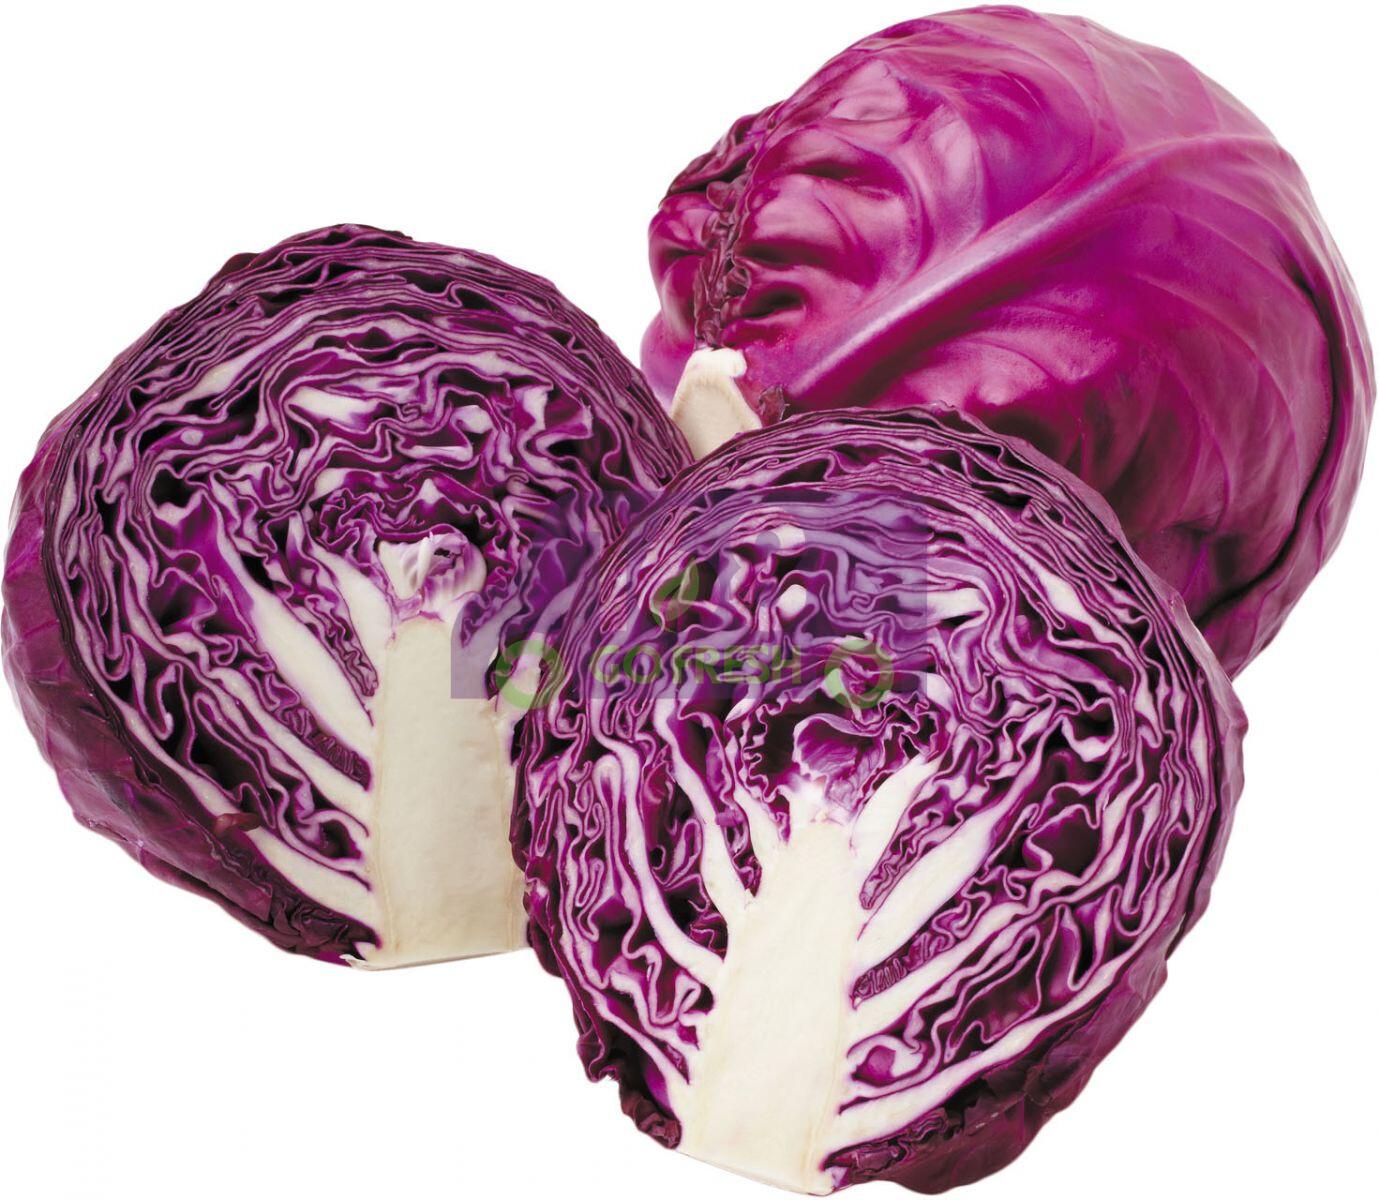 PURPLE CABBAGE 紫心包菜